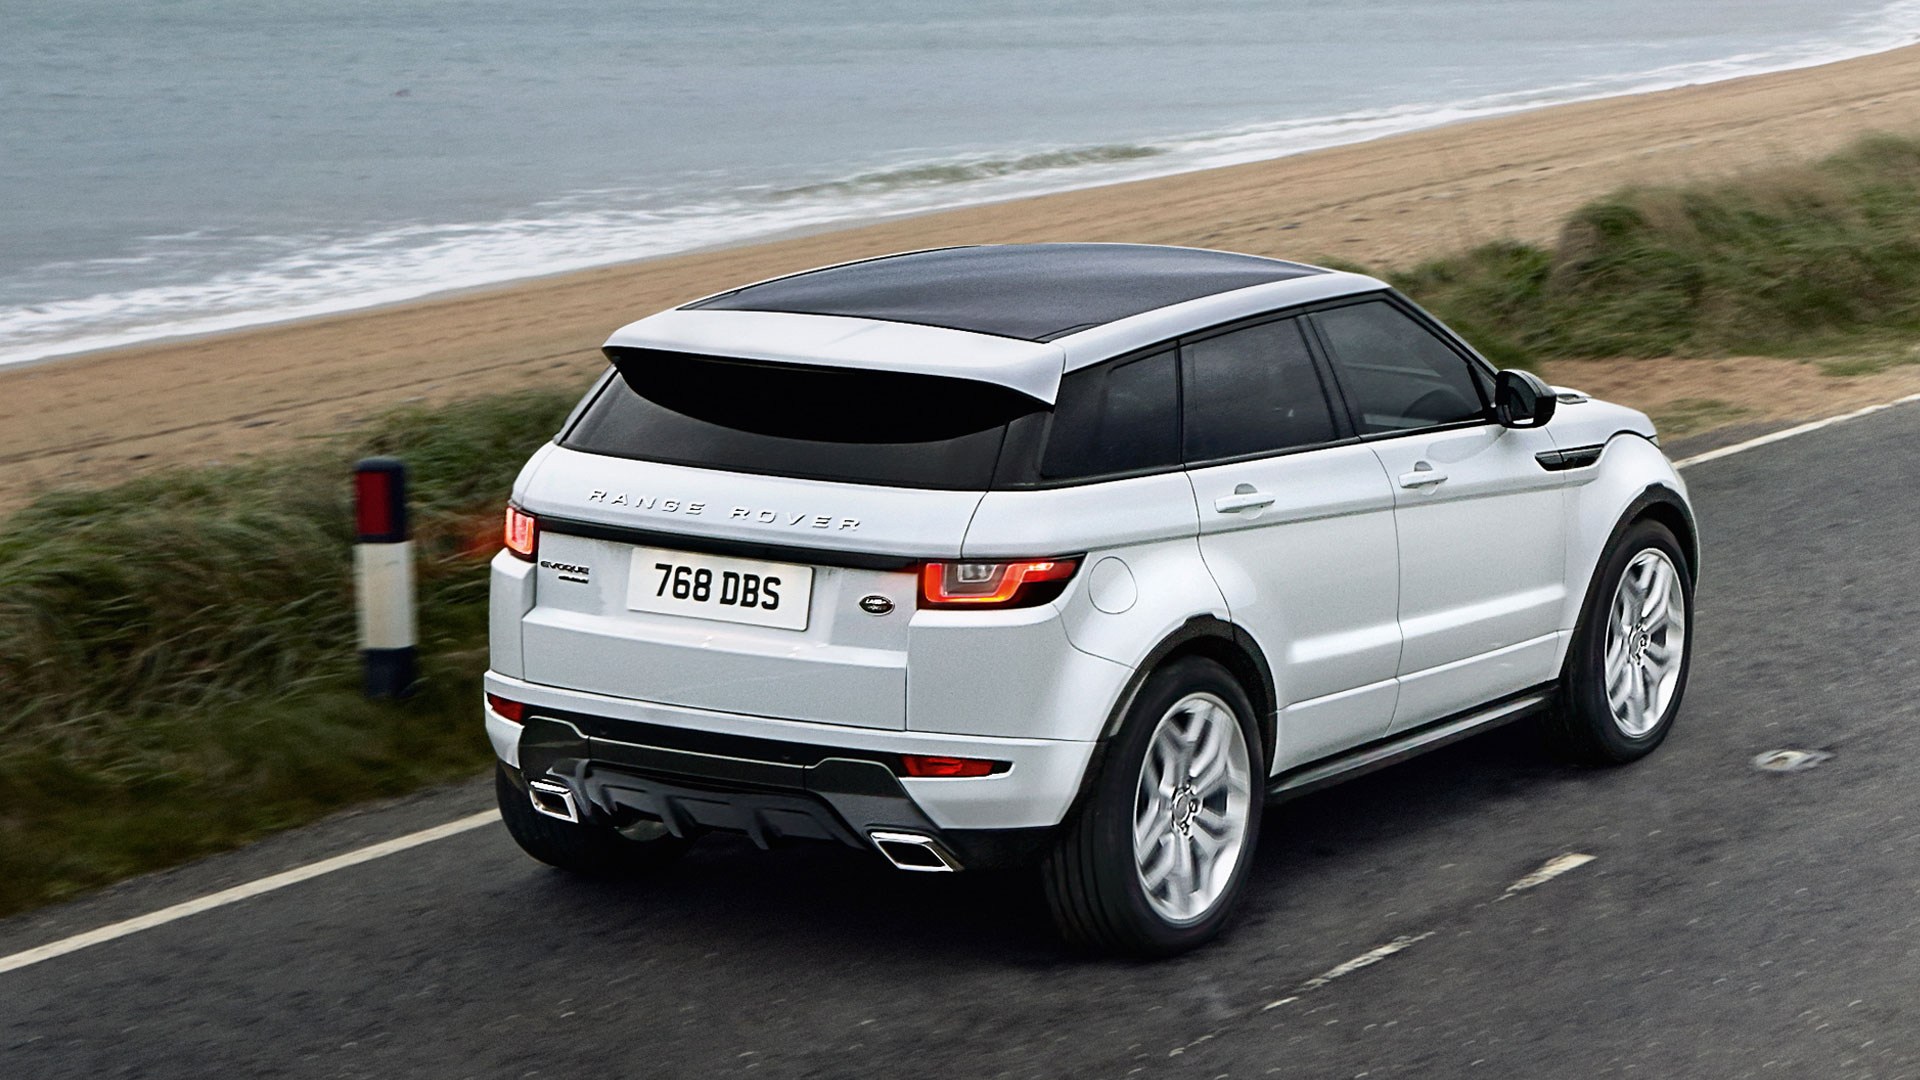 Land Rover Range Rover Evoque 2017 Price Mileage Reviews